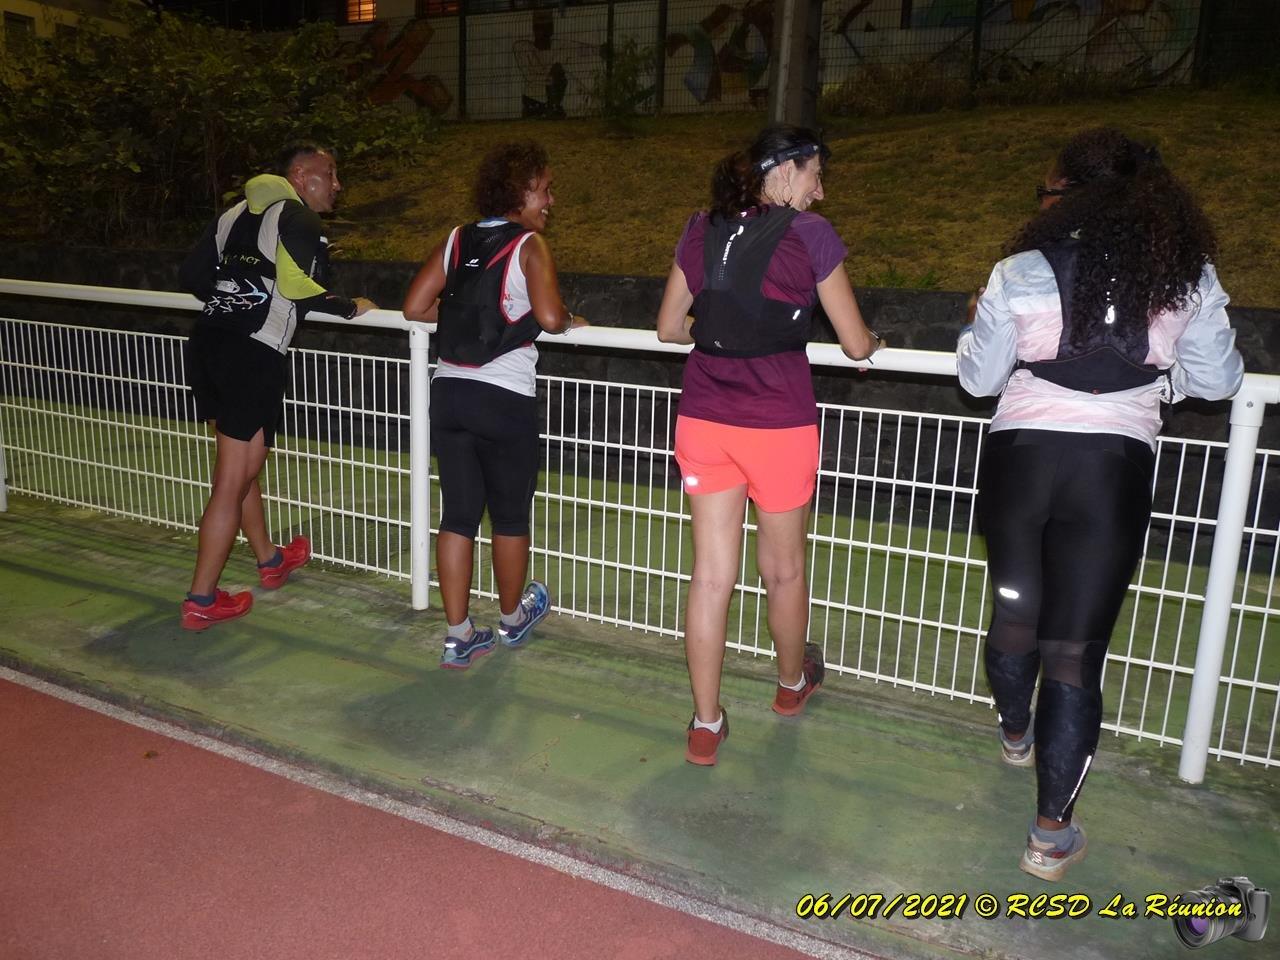 20210706 Entrain Trail Trinité 050